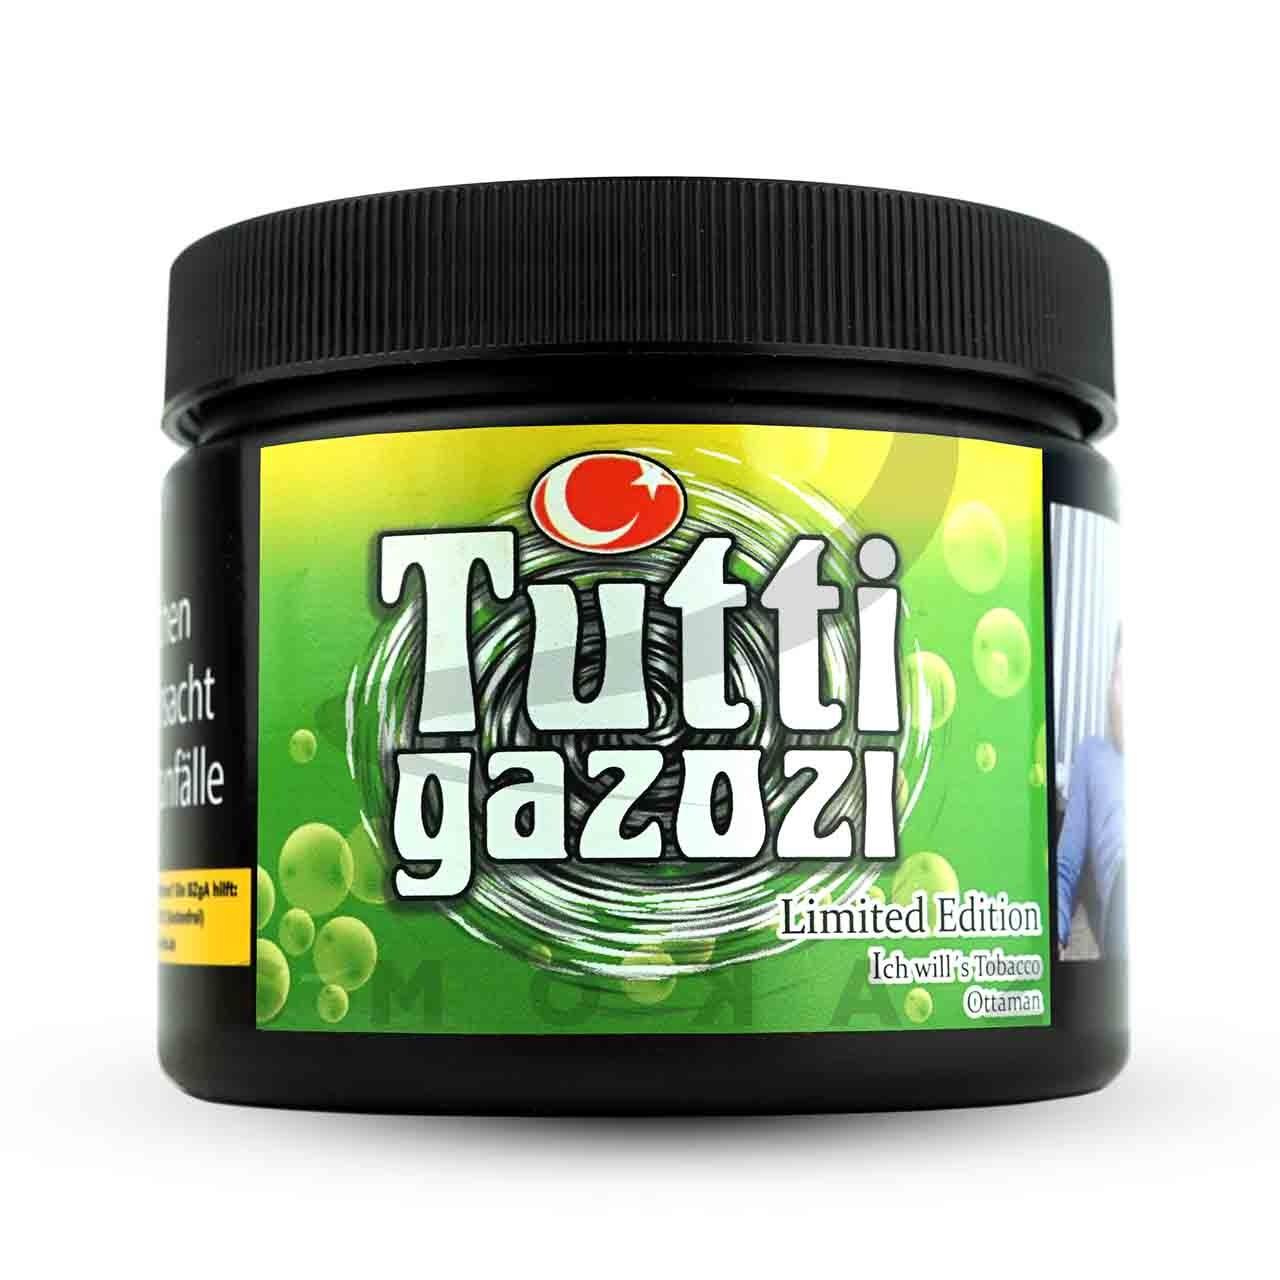 Ottaman Limited Edition - Tutti Gazozi 200g